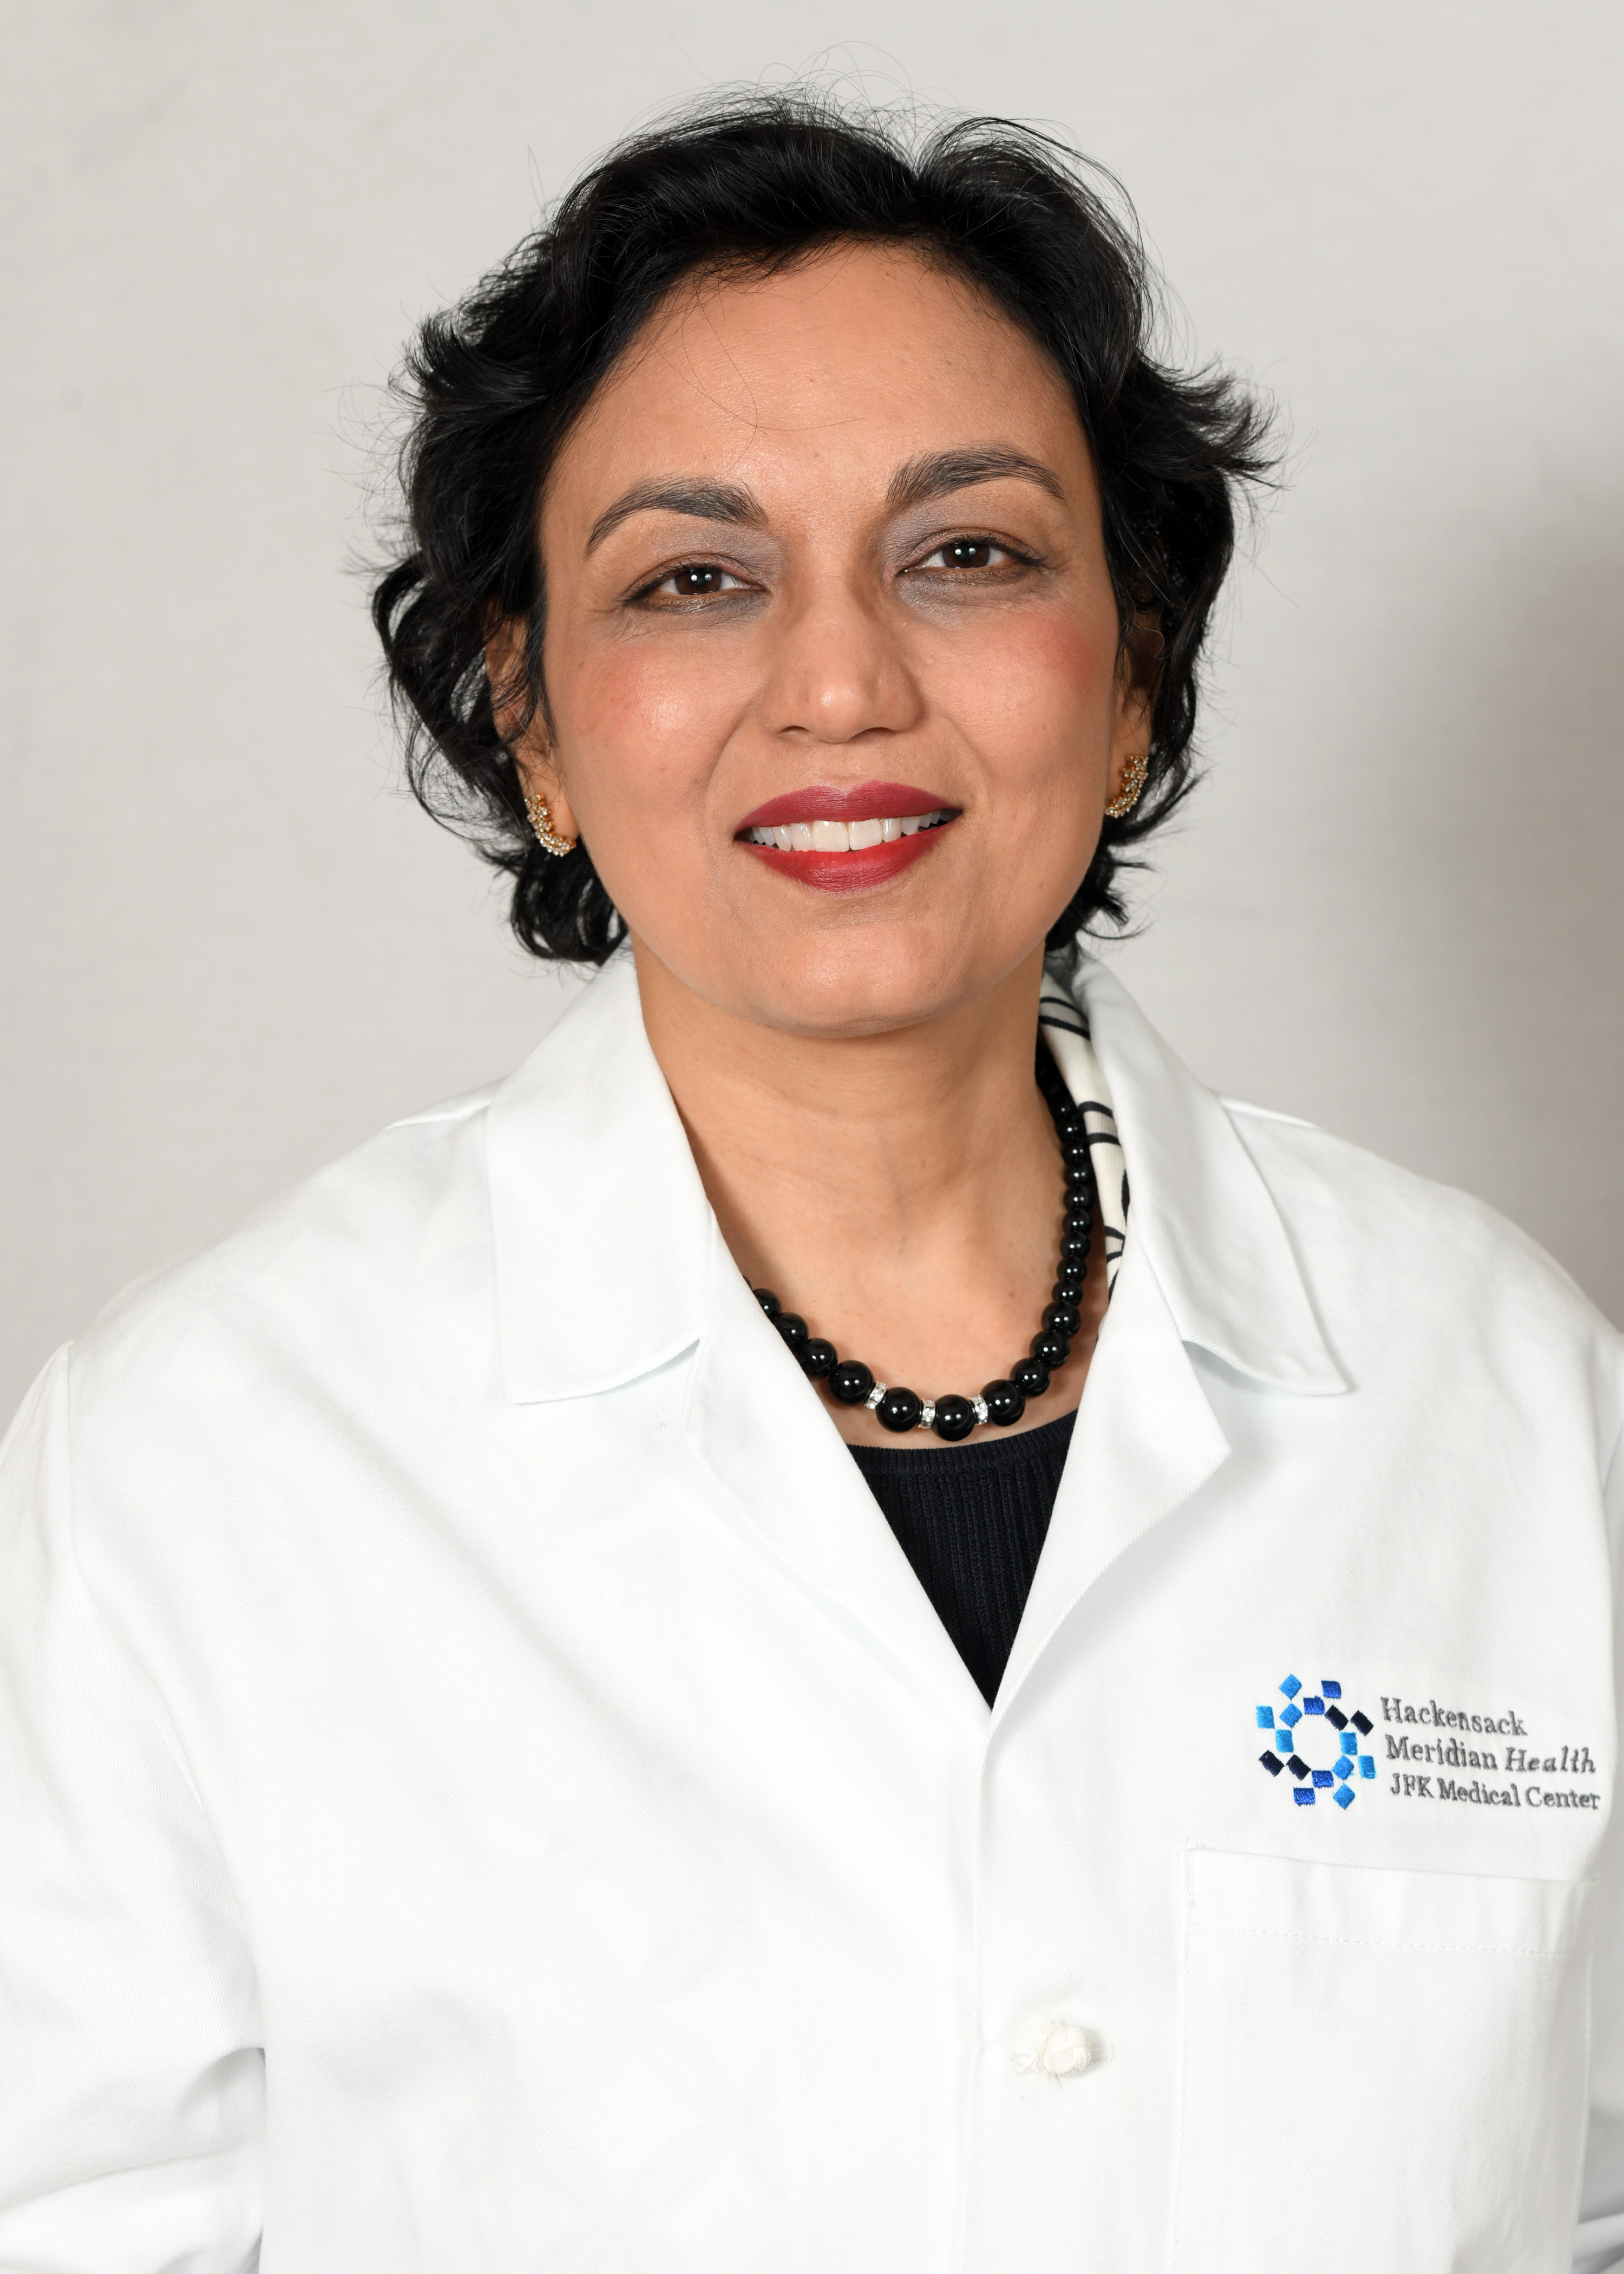 Image of Divya Gupta, M.D.